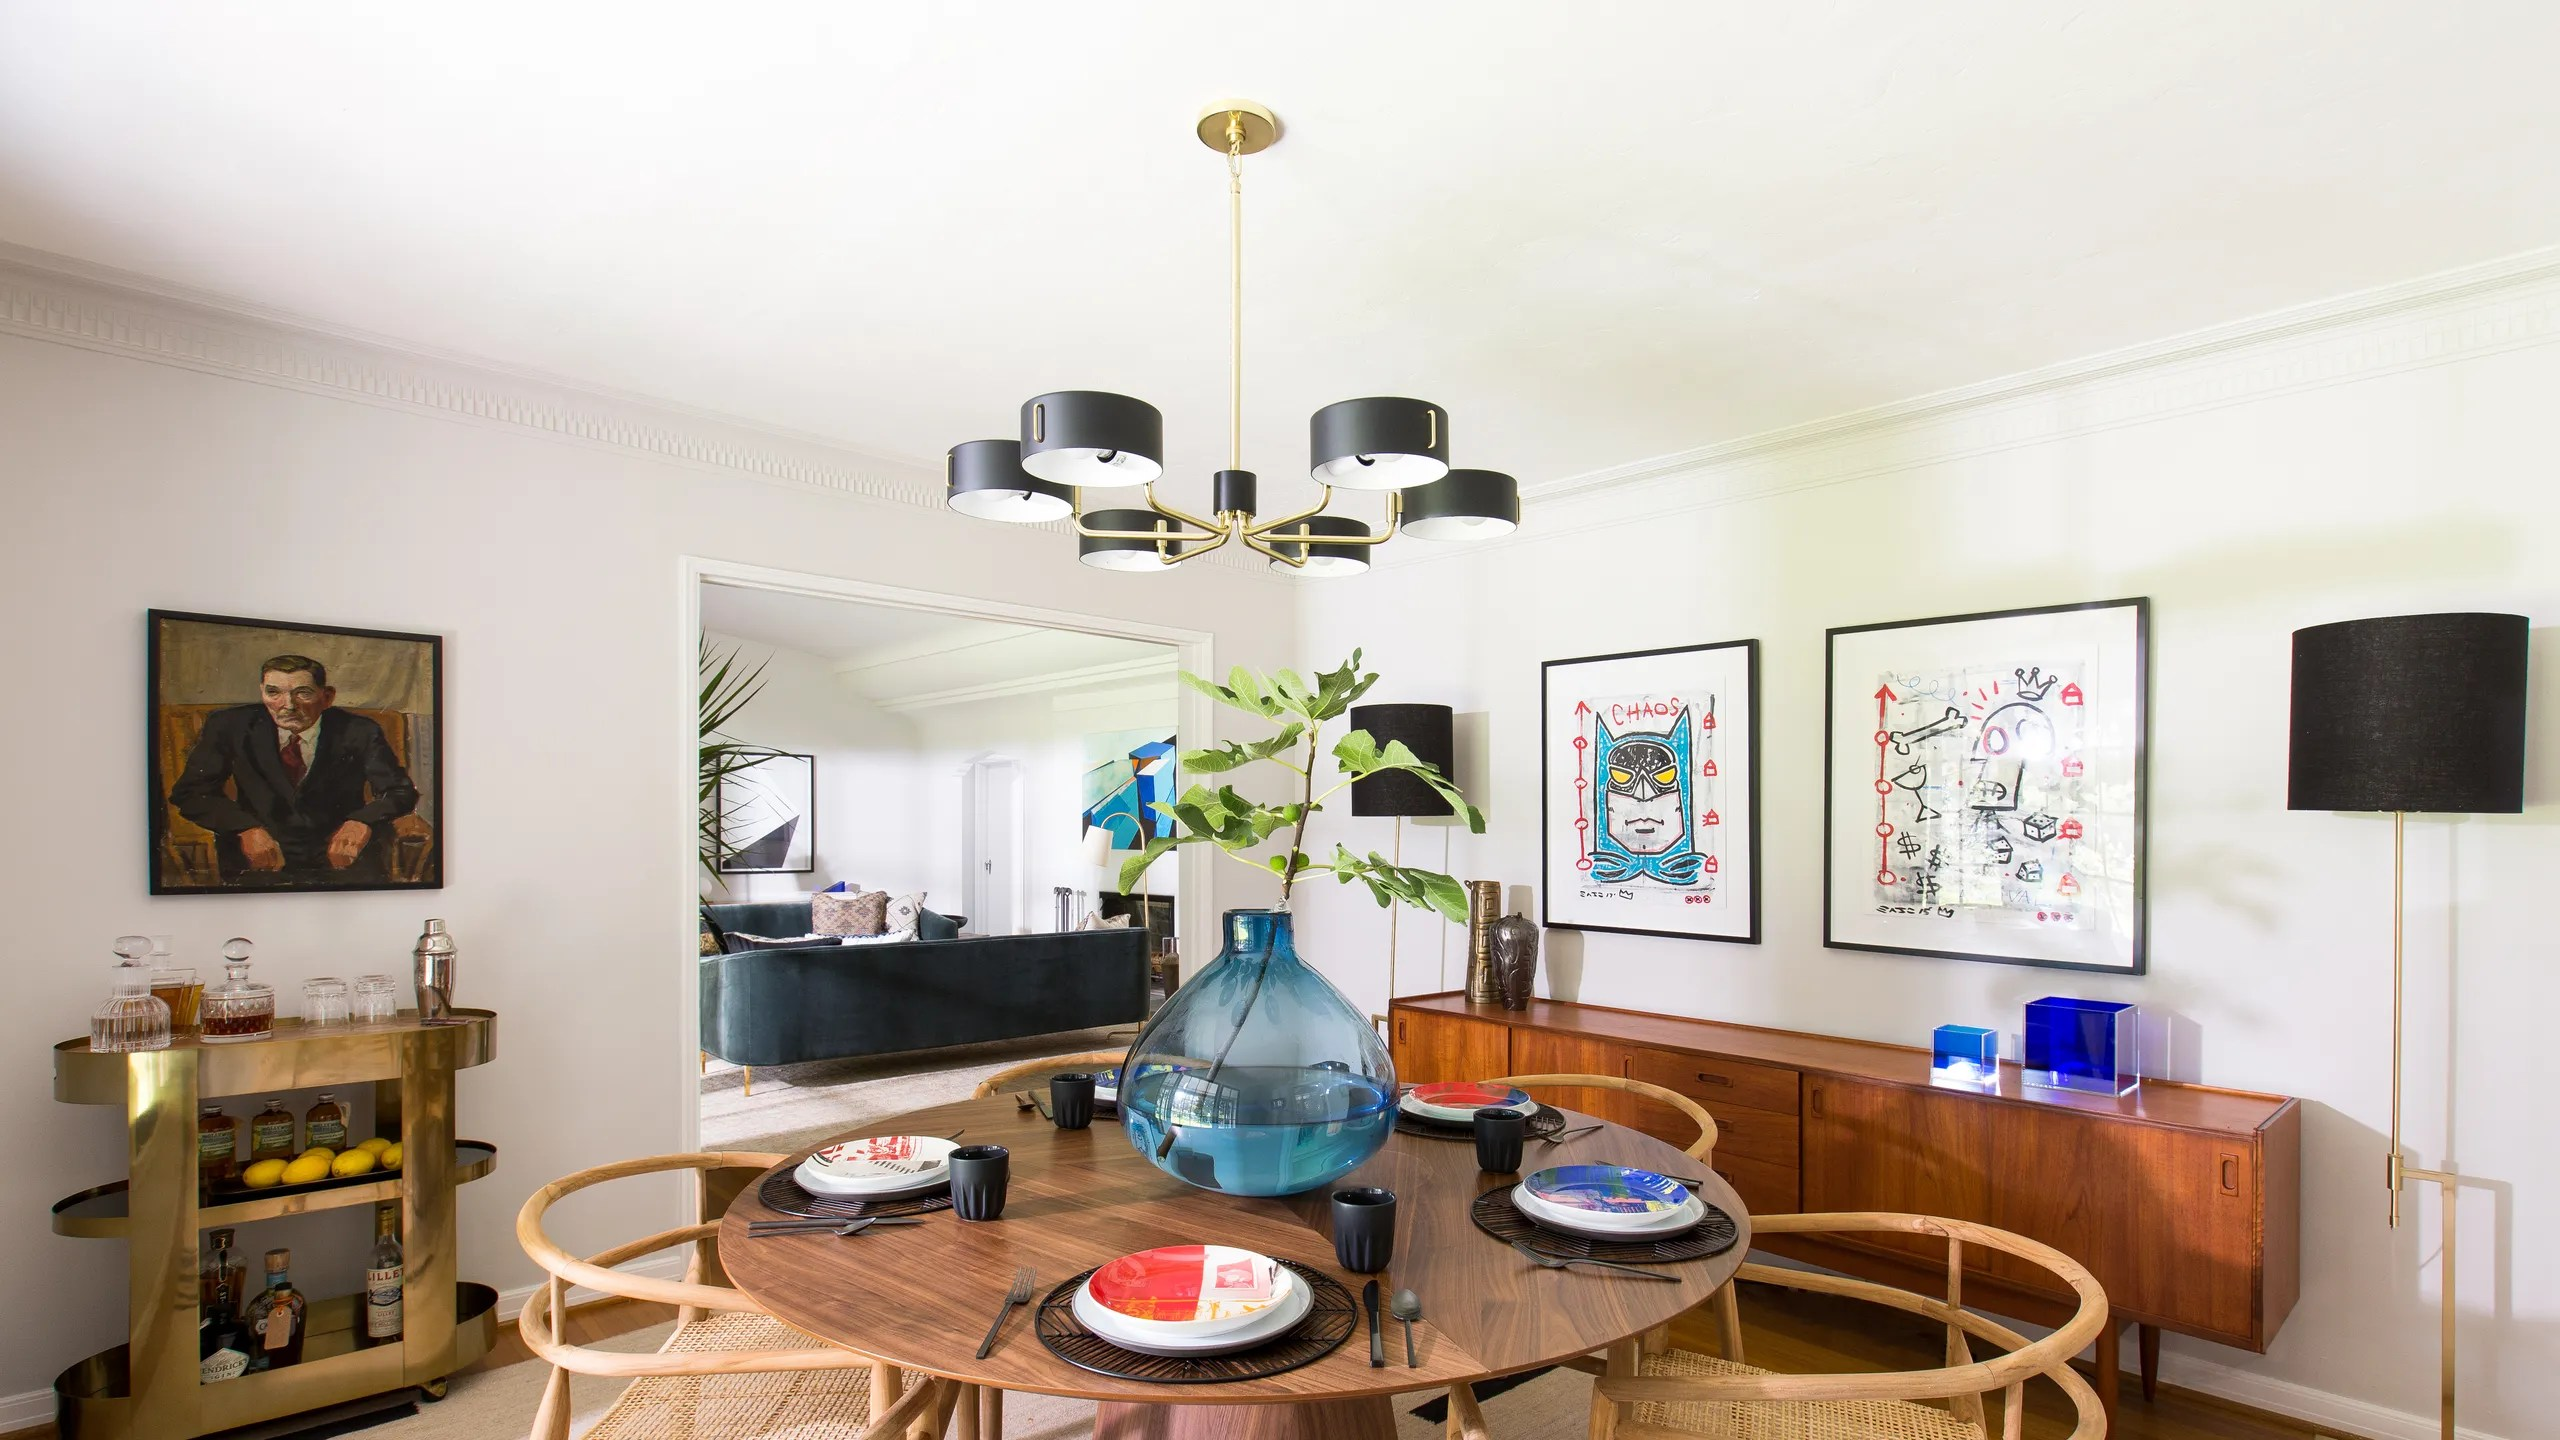 8 Midcentury Modern Decor Style Ideas Tips For Interior